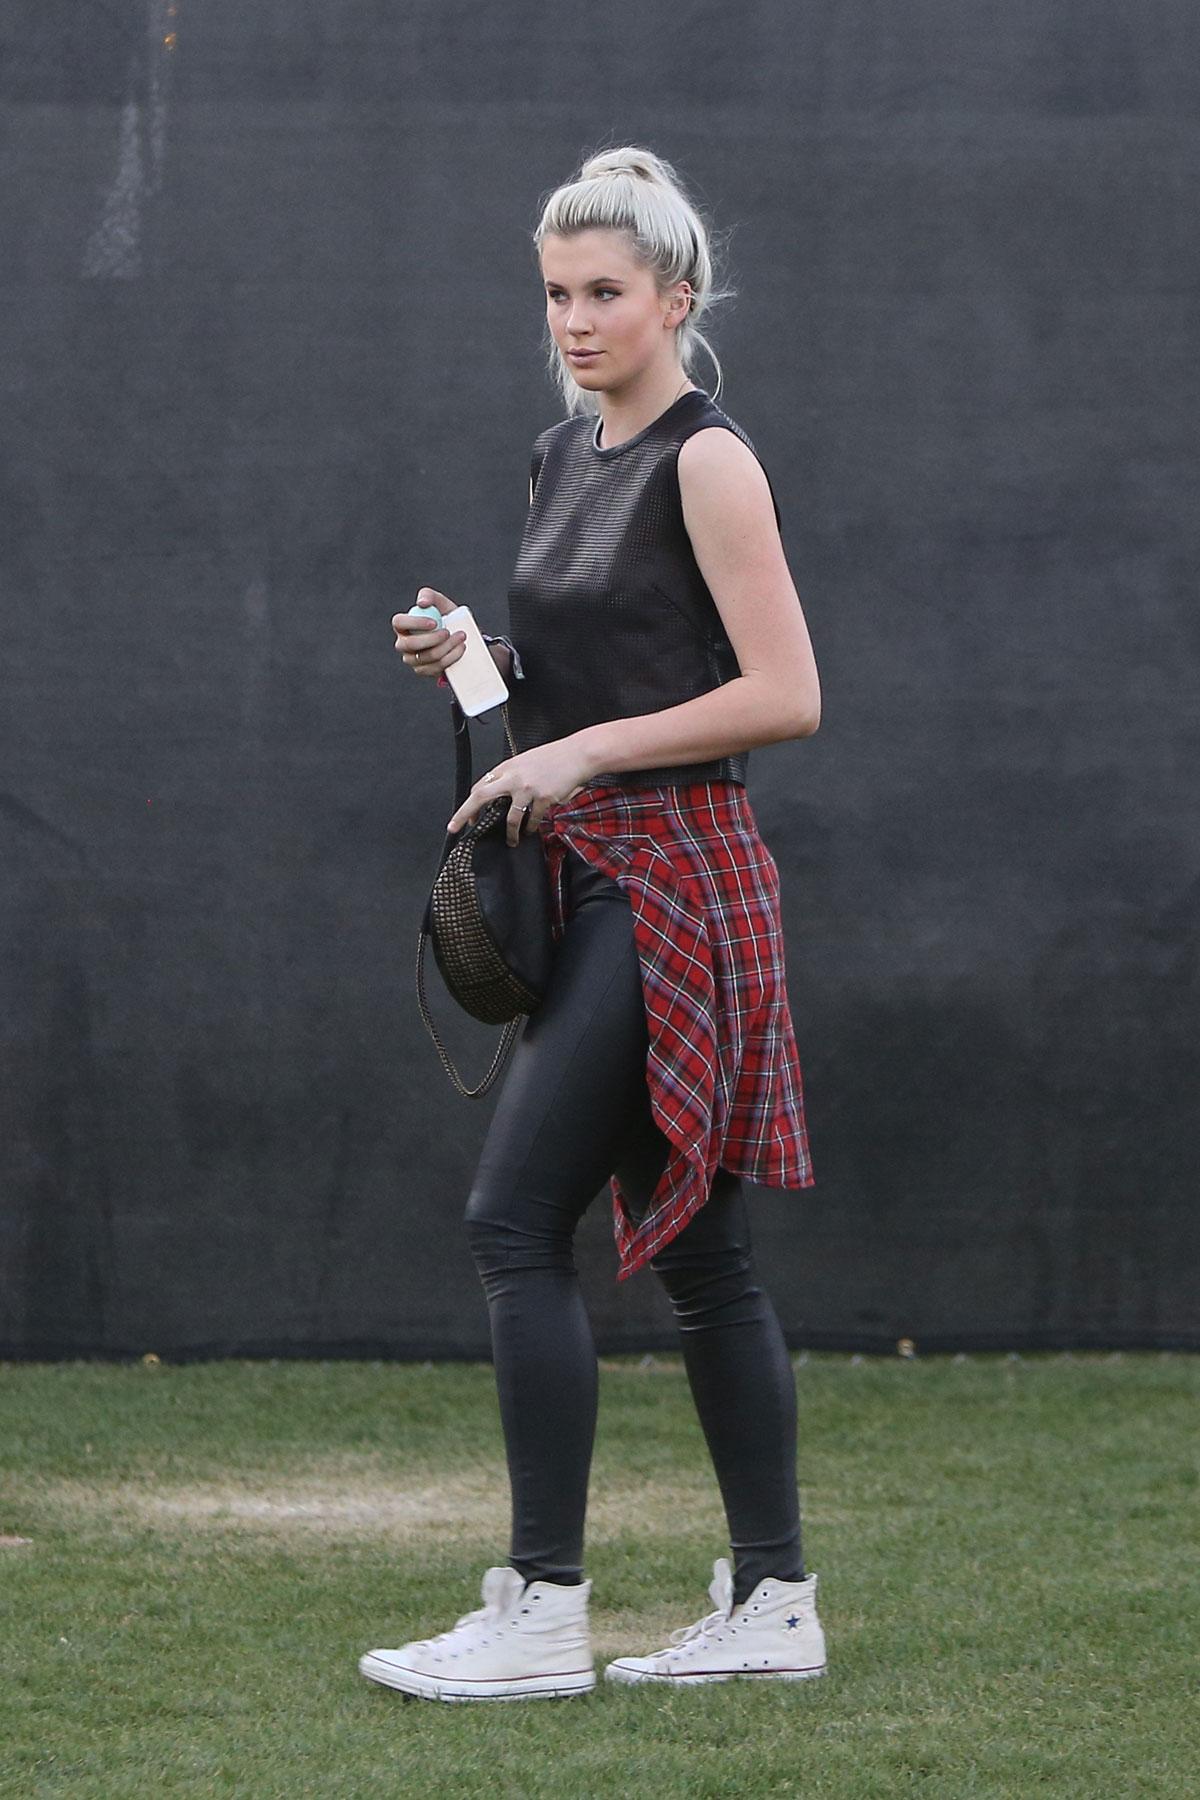 Ireland Baldwin attends Coachella Music Festival